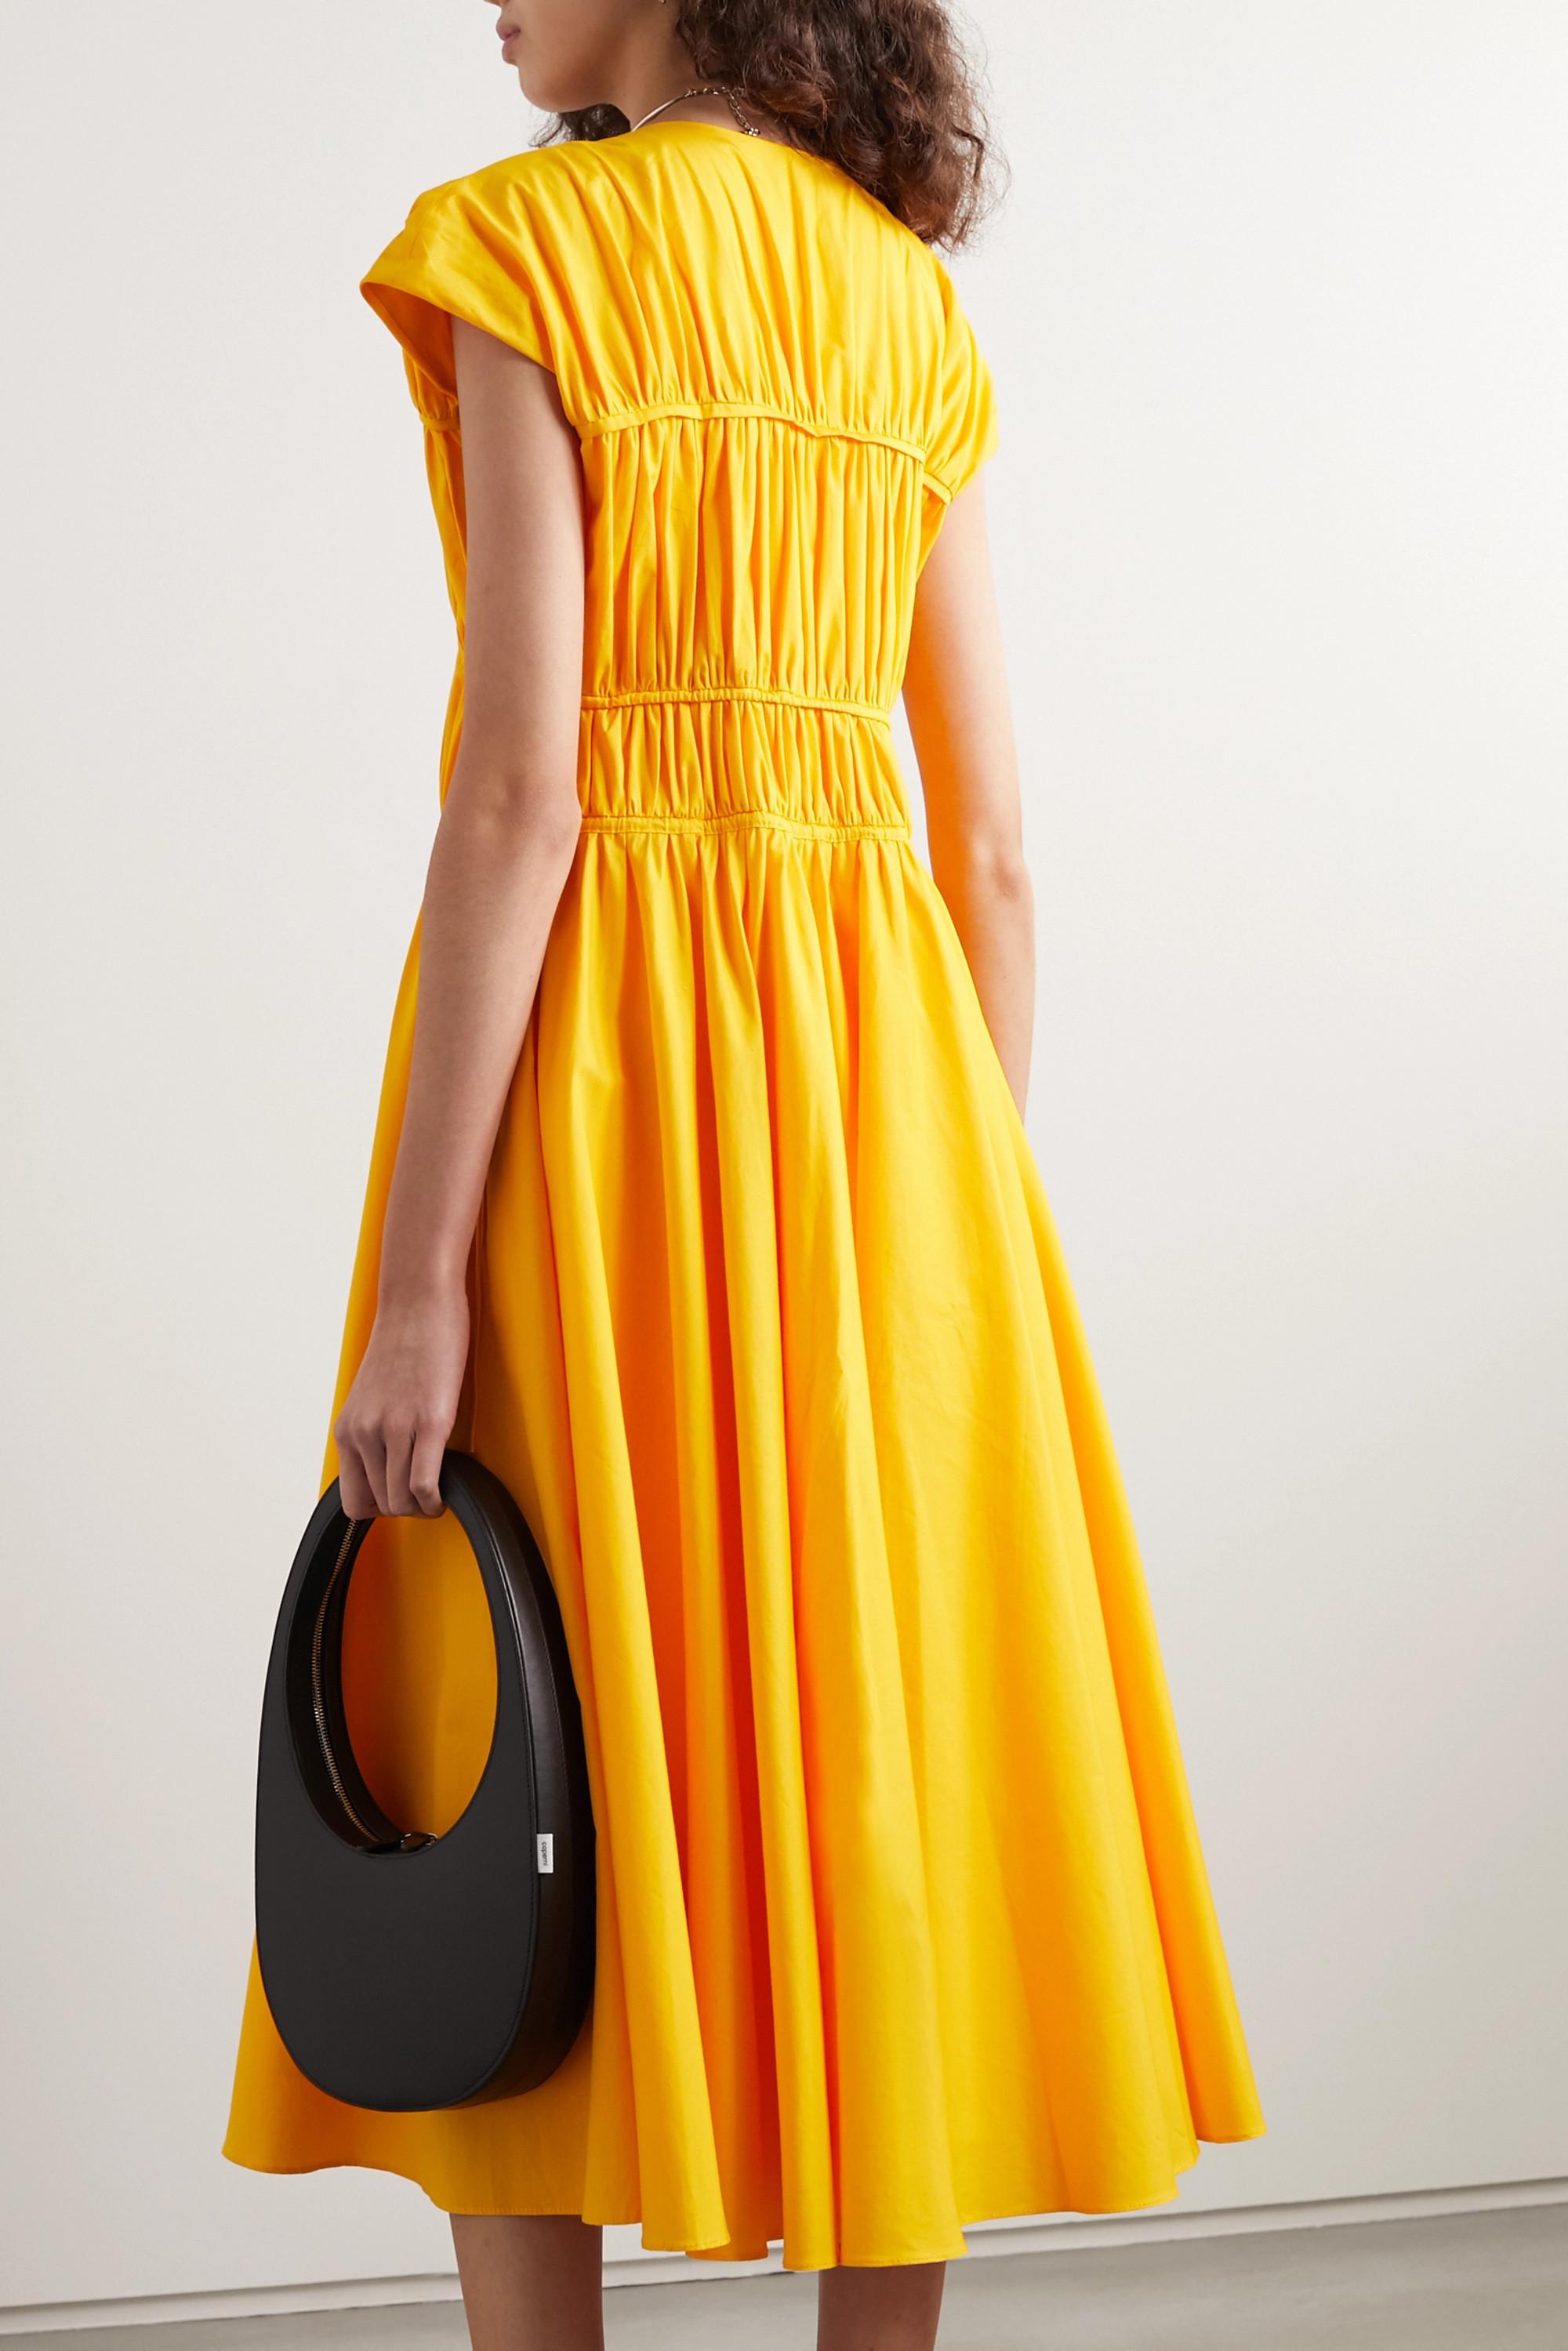 Marigold Ceres Tie-detailed Gathered Cotton-poplin Midi Dress | Tove